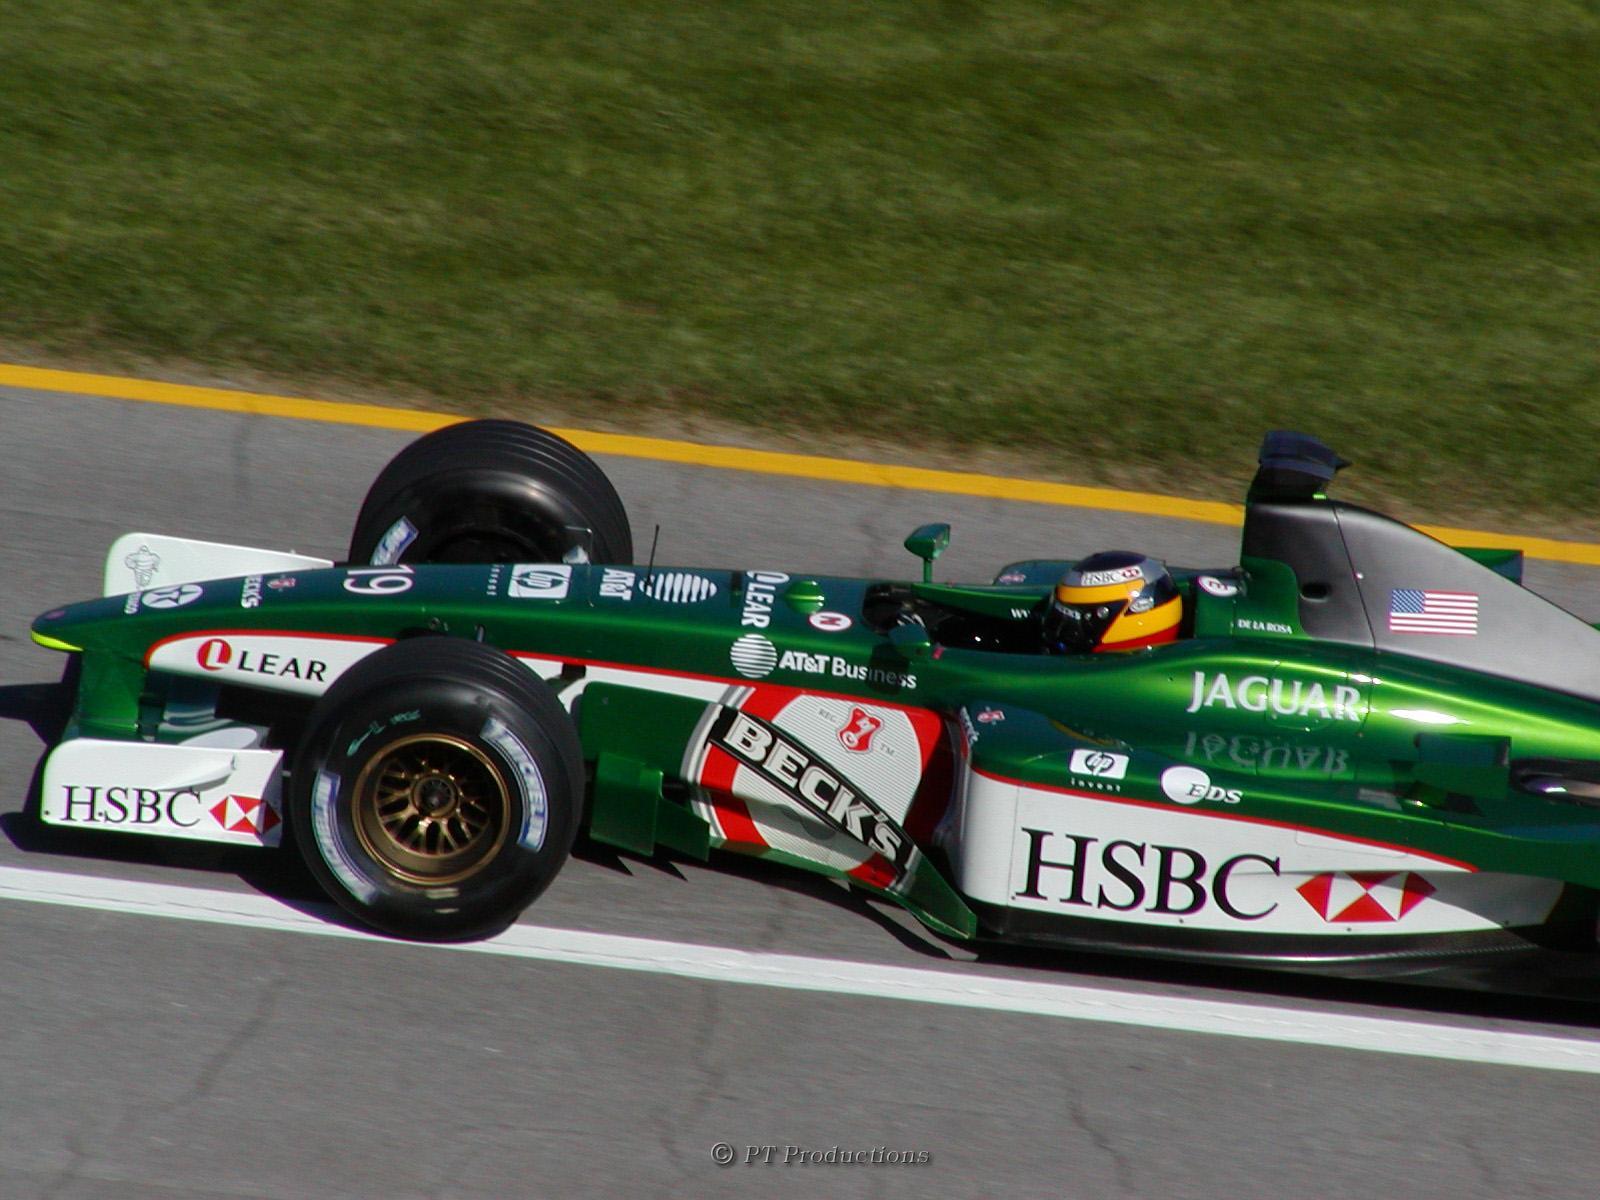 Image Red Racing Car